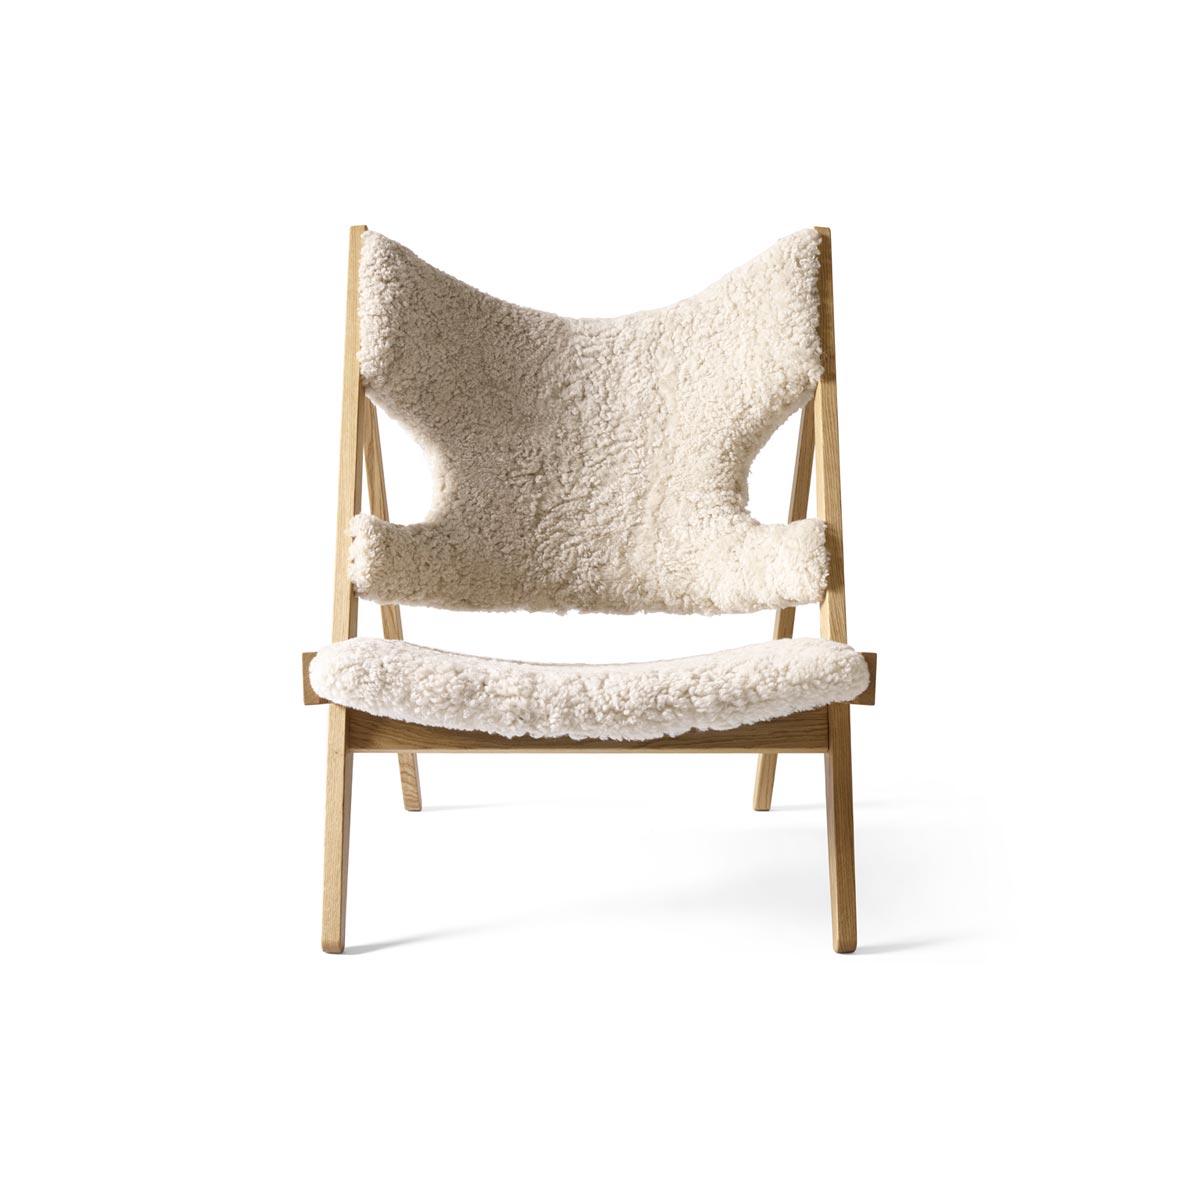 9681649 Knitting Lounge Chair Natural Oak Moonlight 21 Front 1